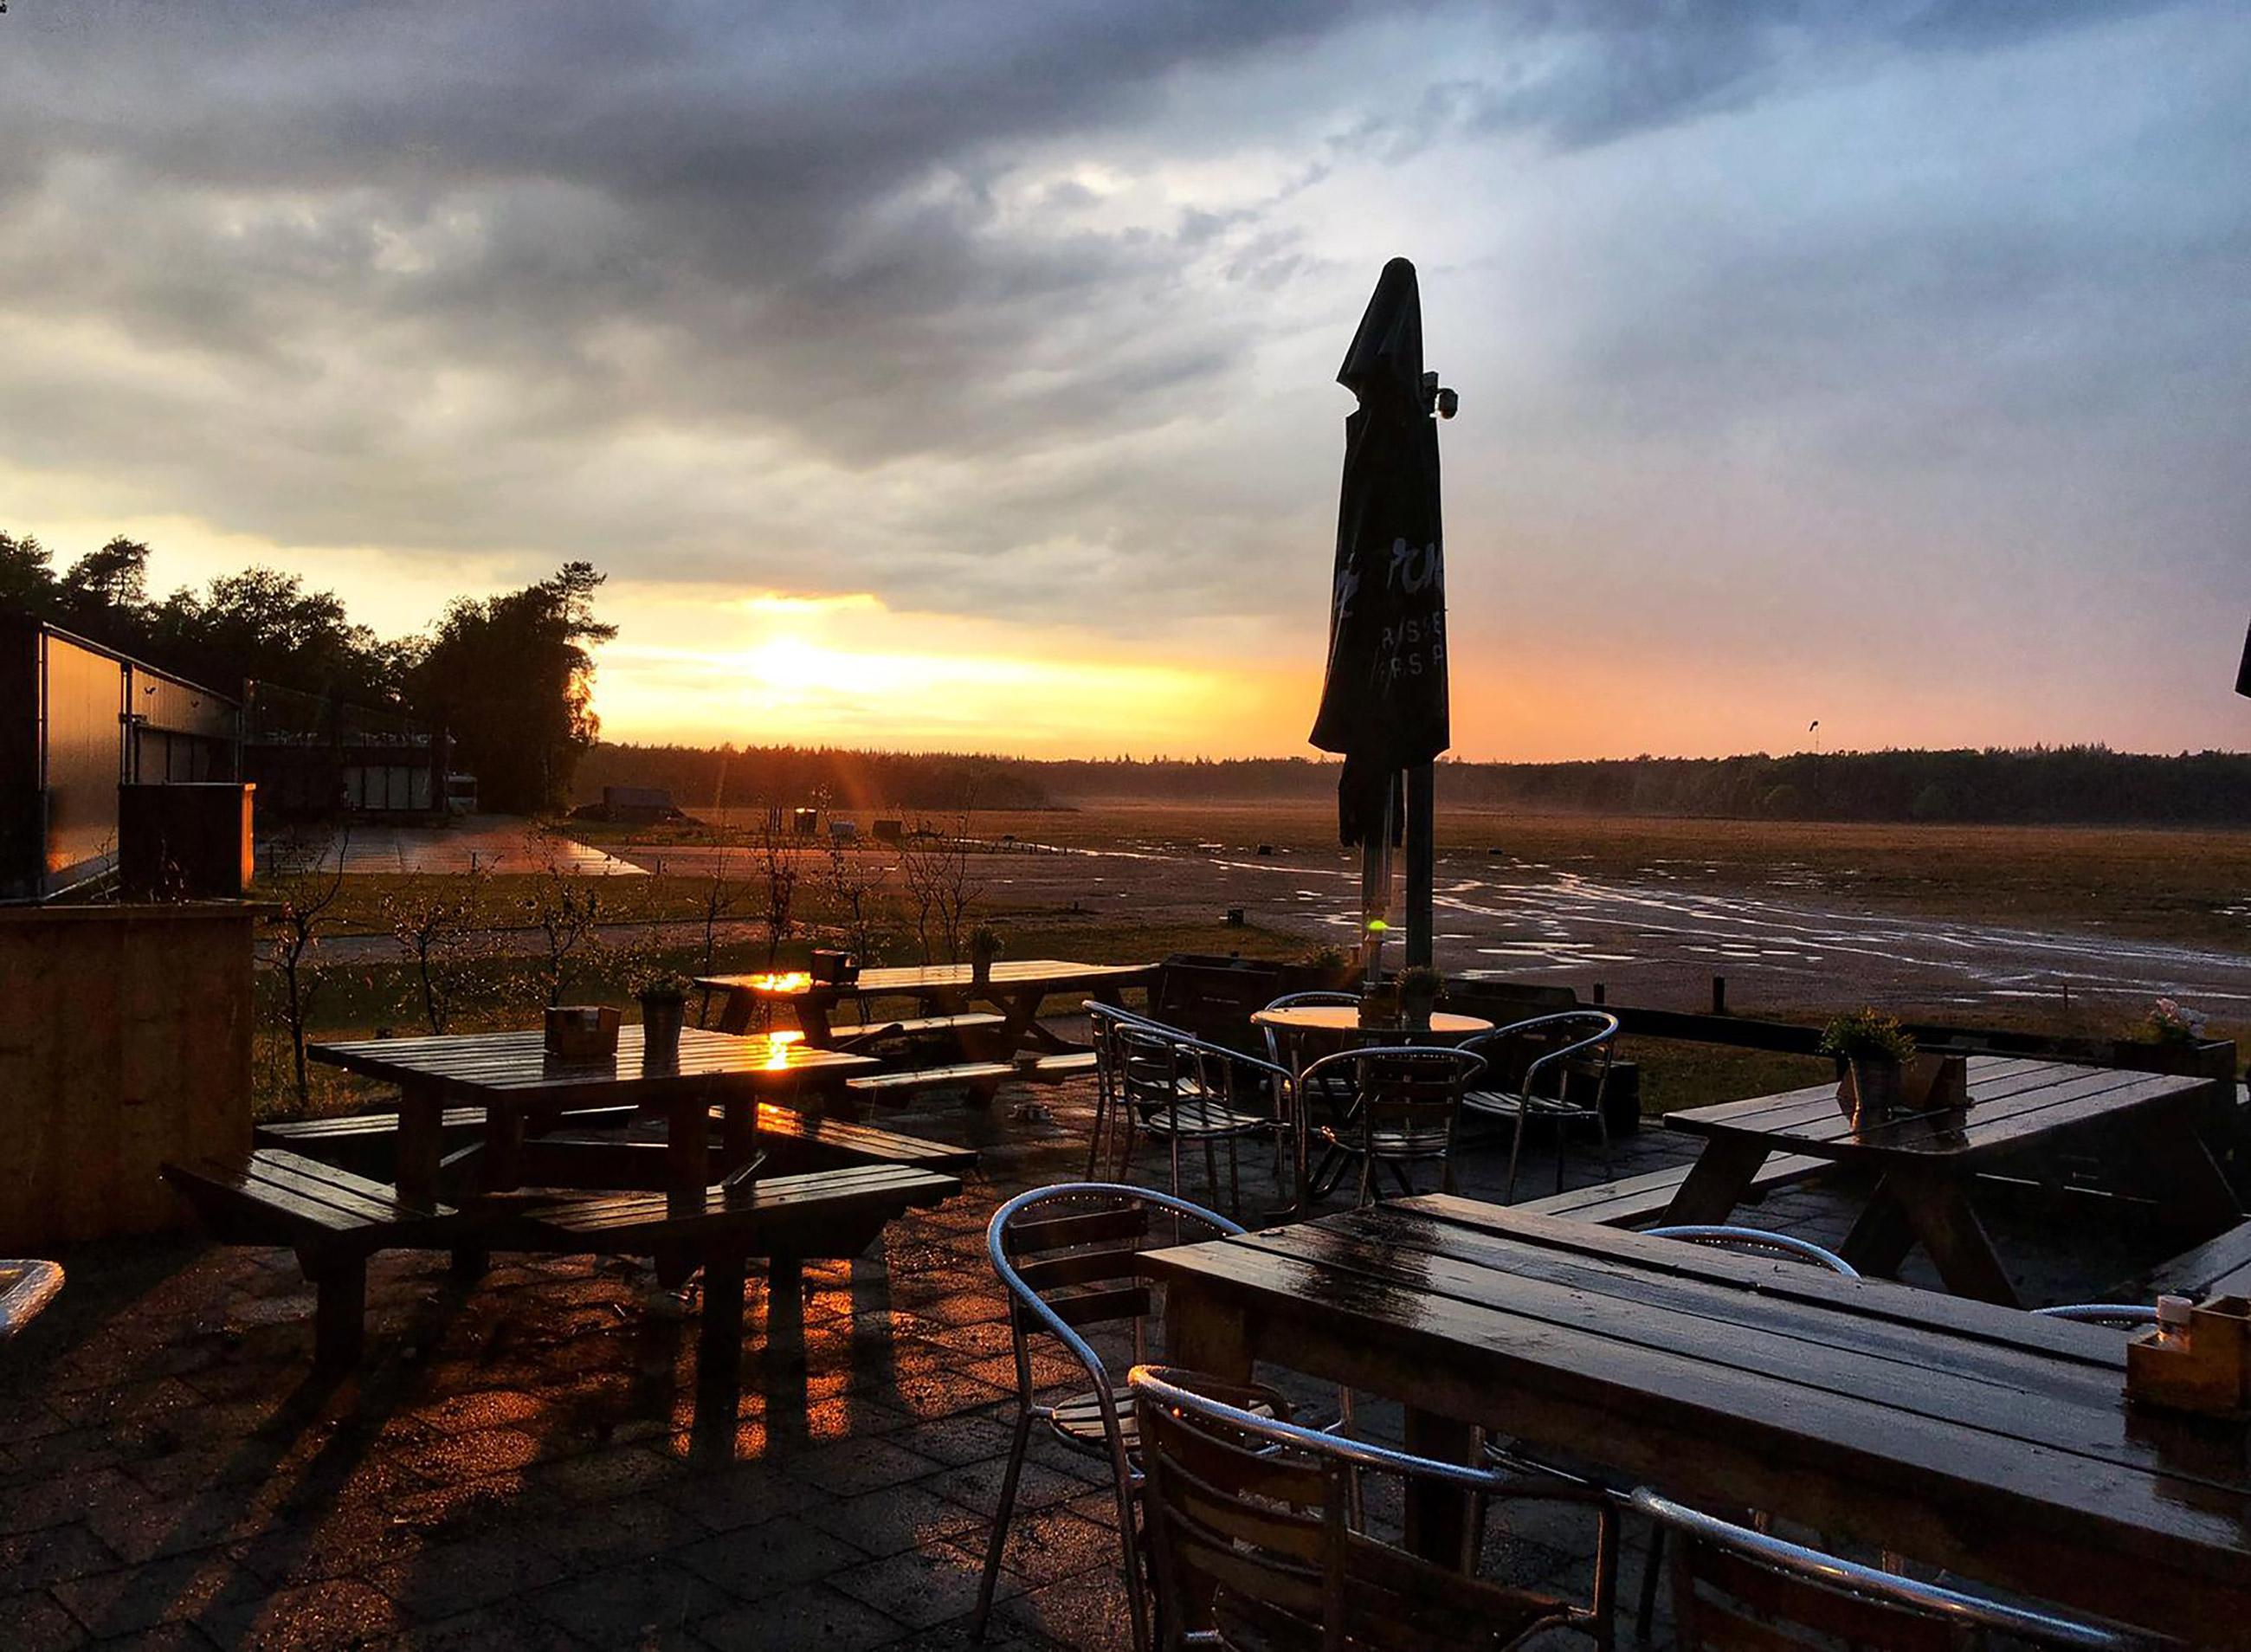 Zweef Inn boscafé Malden: Hoogvlieger in gastvrijheid